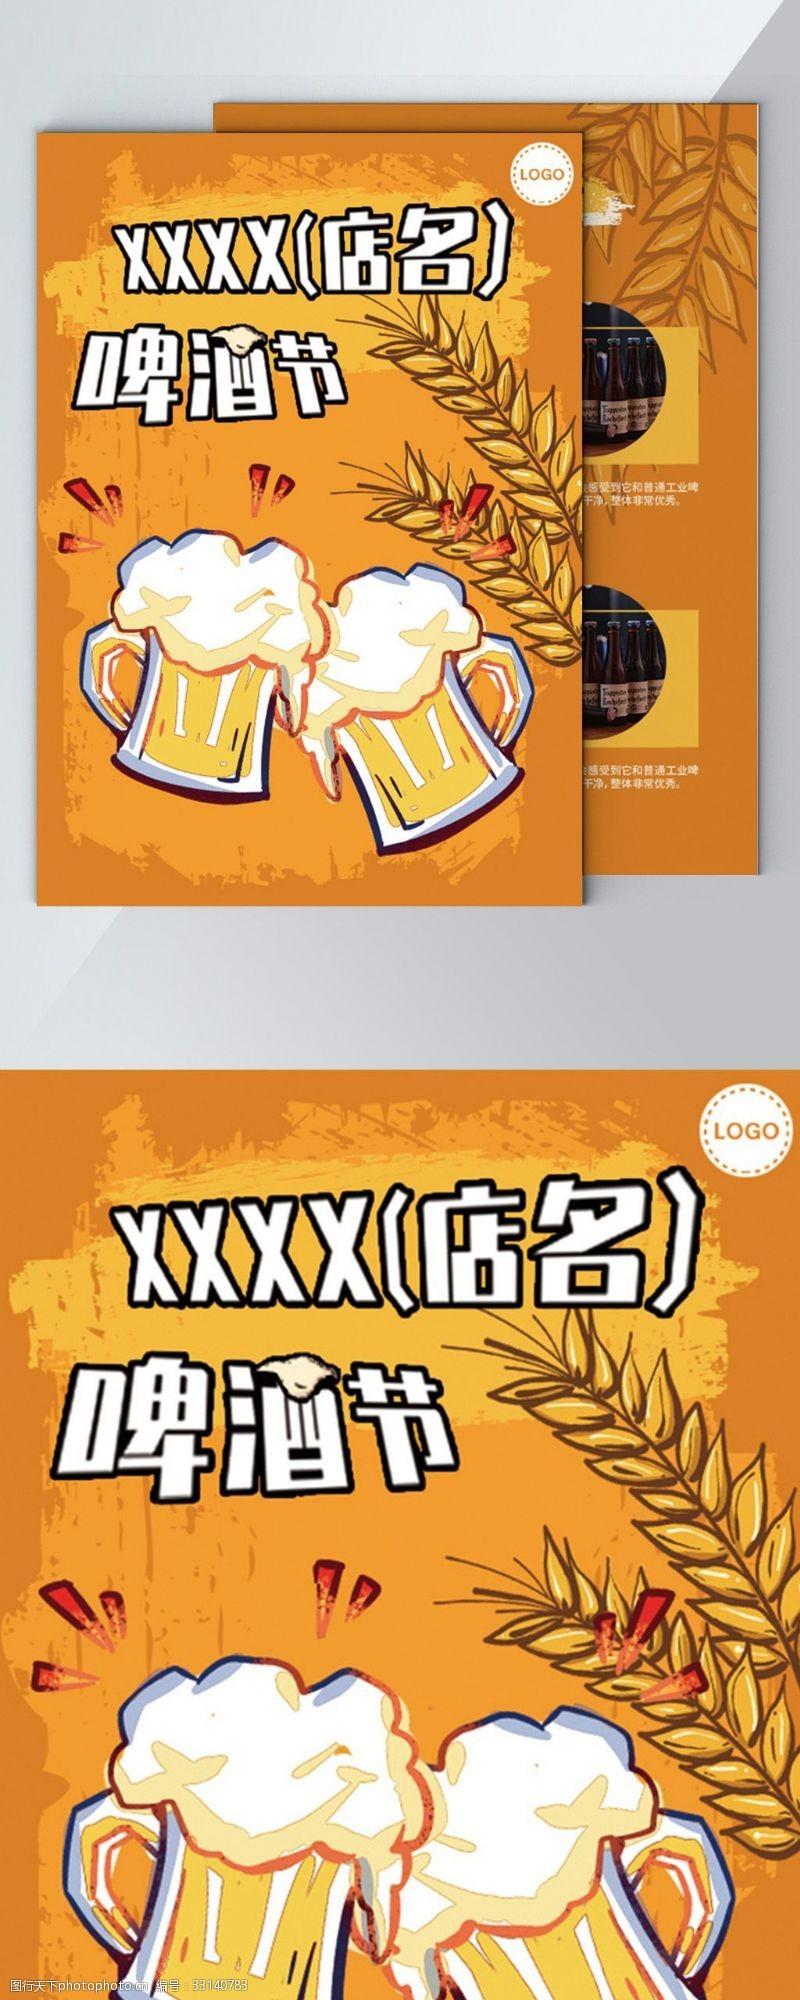 dm宣傳單美食啤酒節DM宣傳單